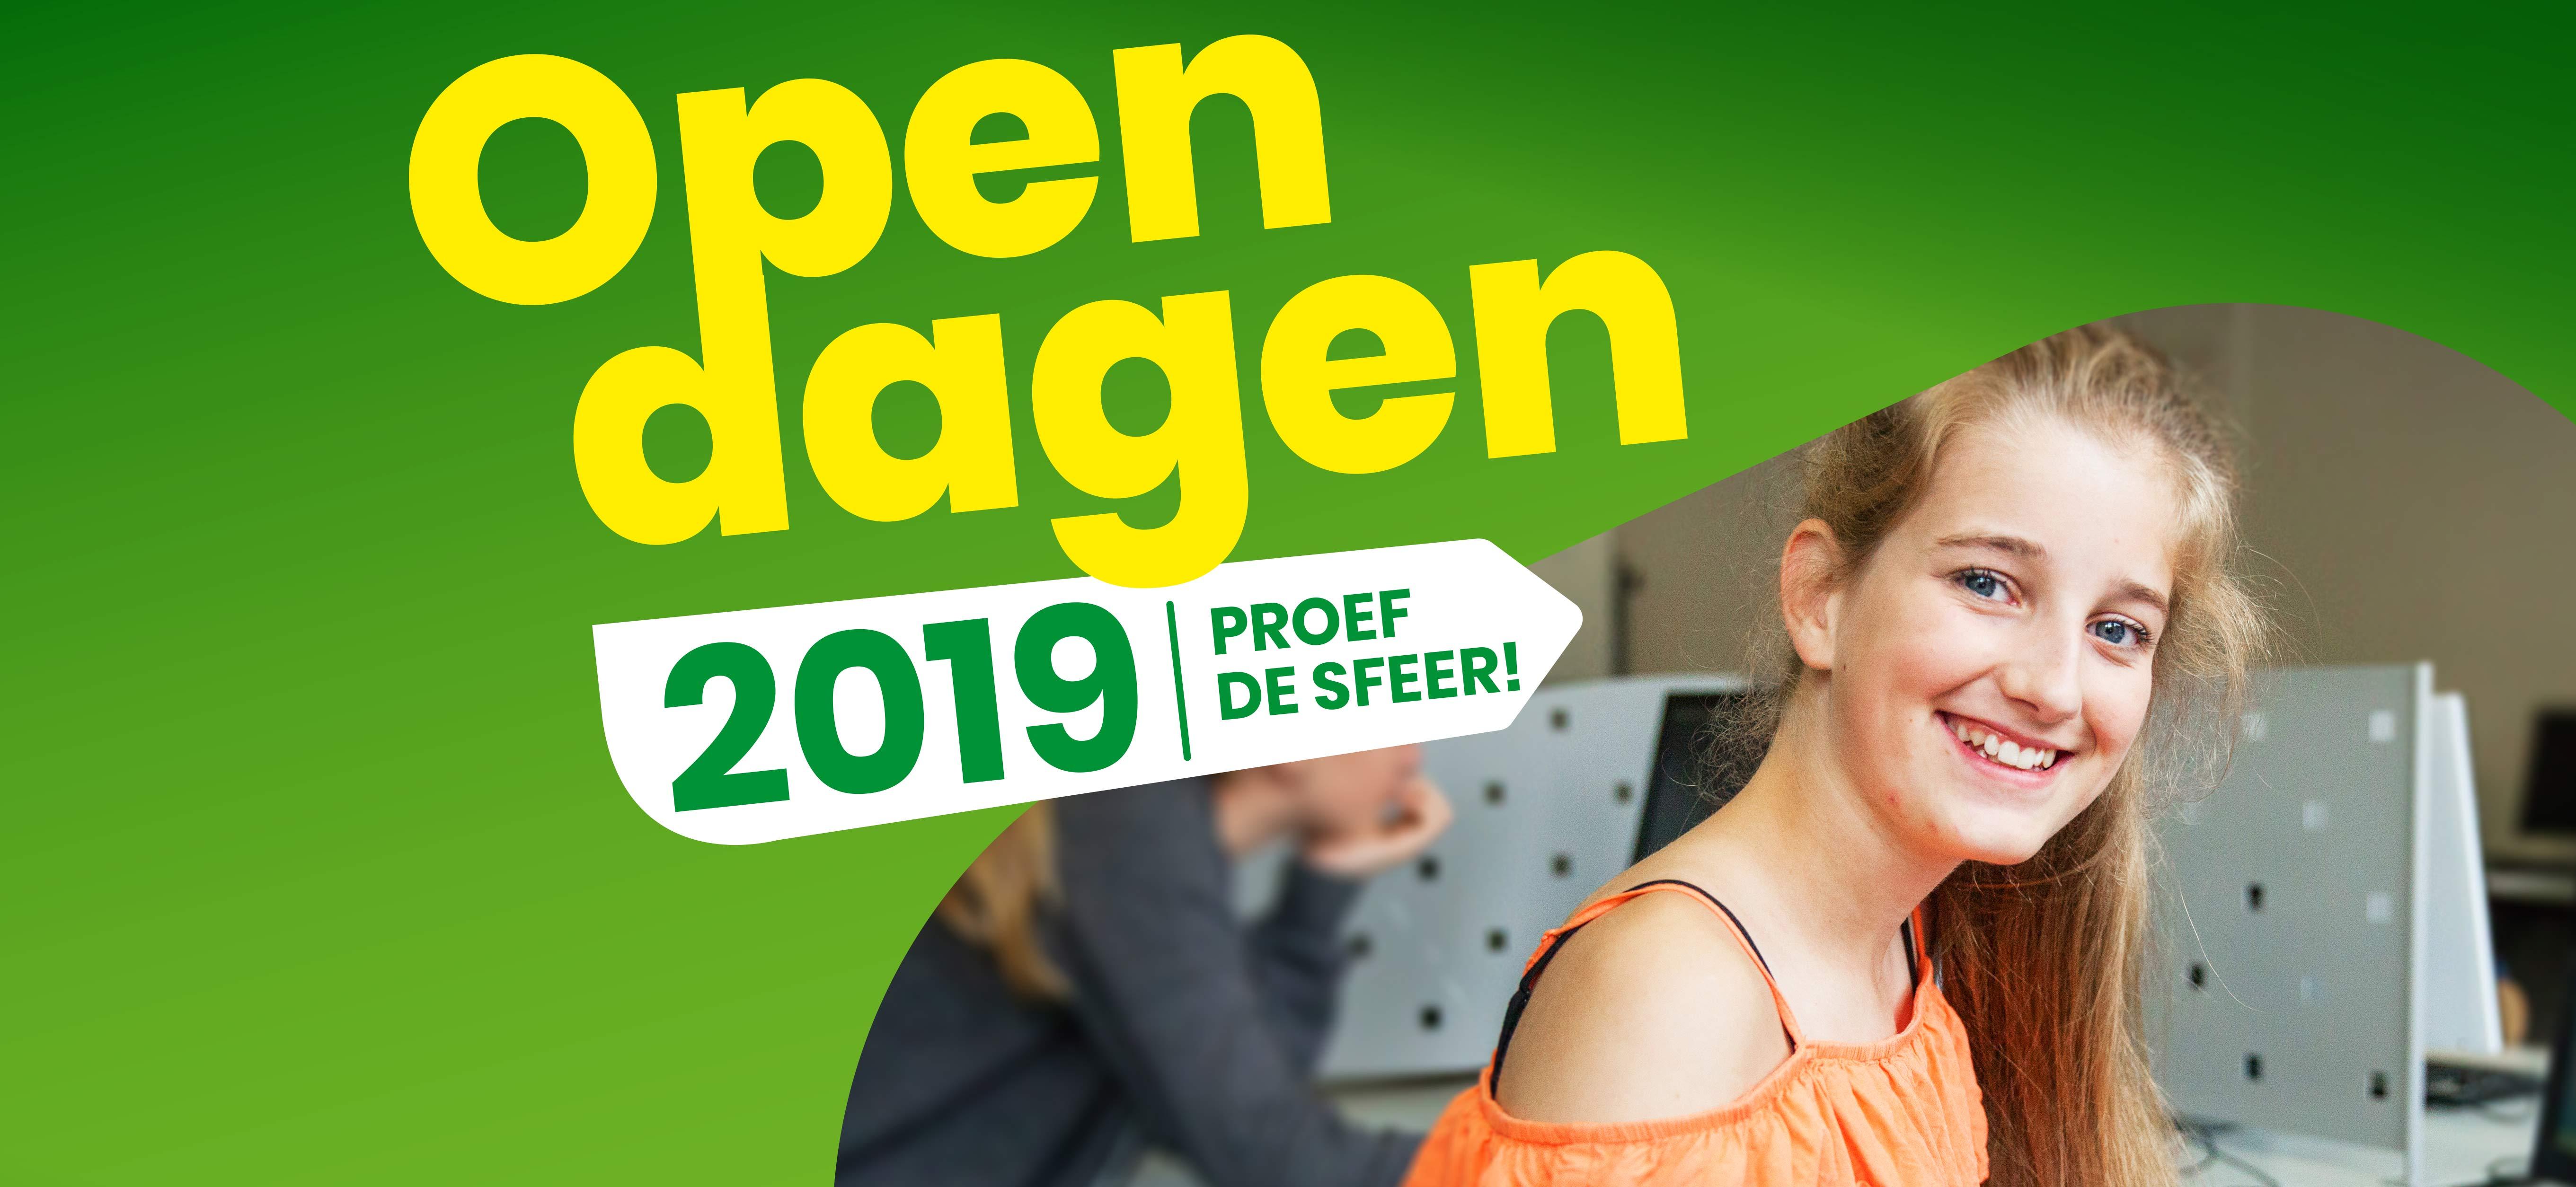 https://www.ubboemmius.nl/wp-content/uploads/2018/12/20181121_ubboemmius_online_opendagen_campagne_NIEUWS_1920x885px.jpg